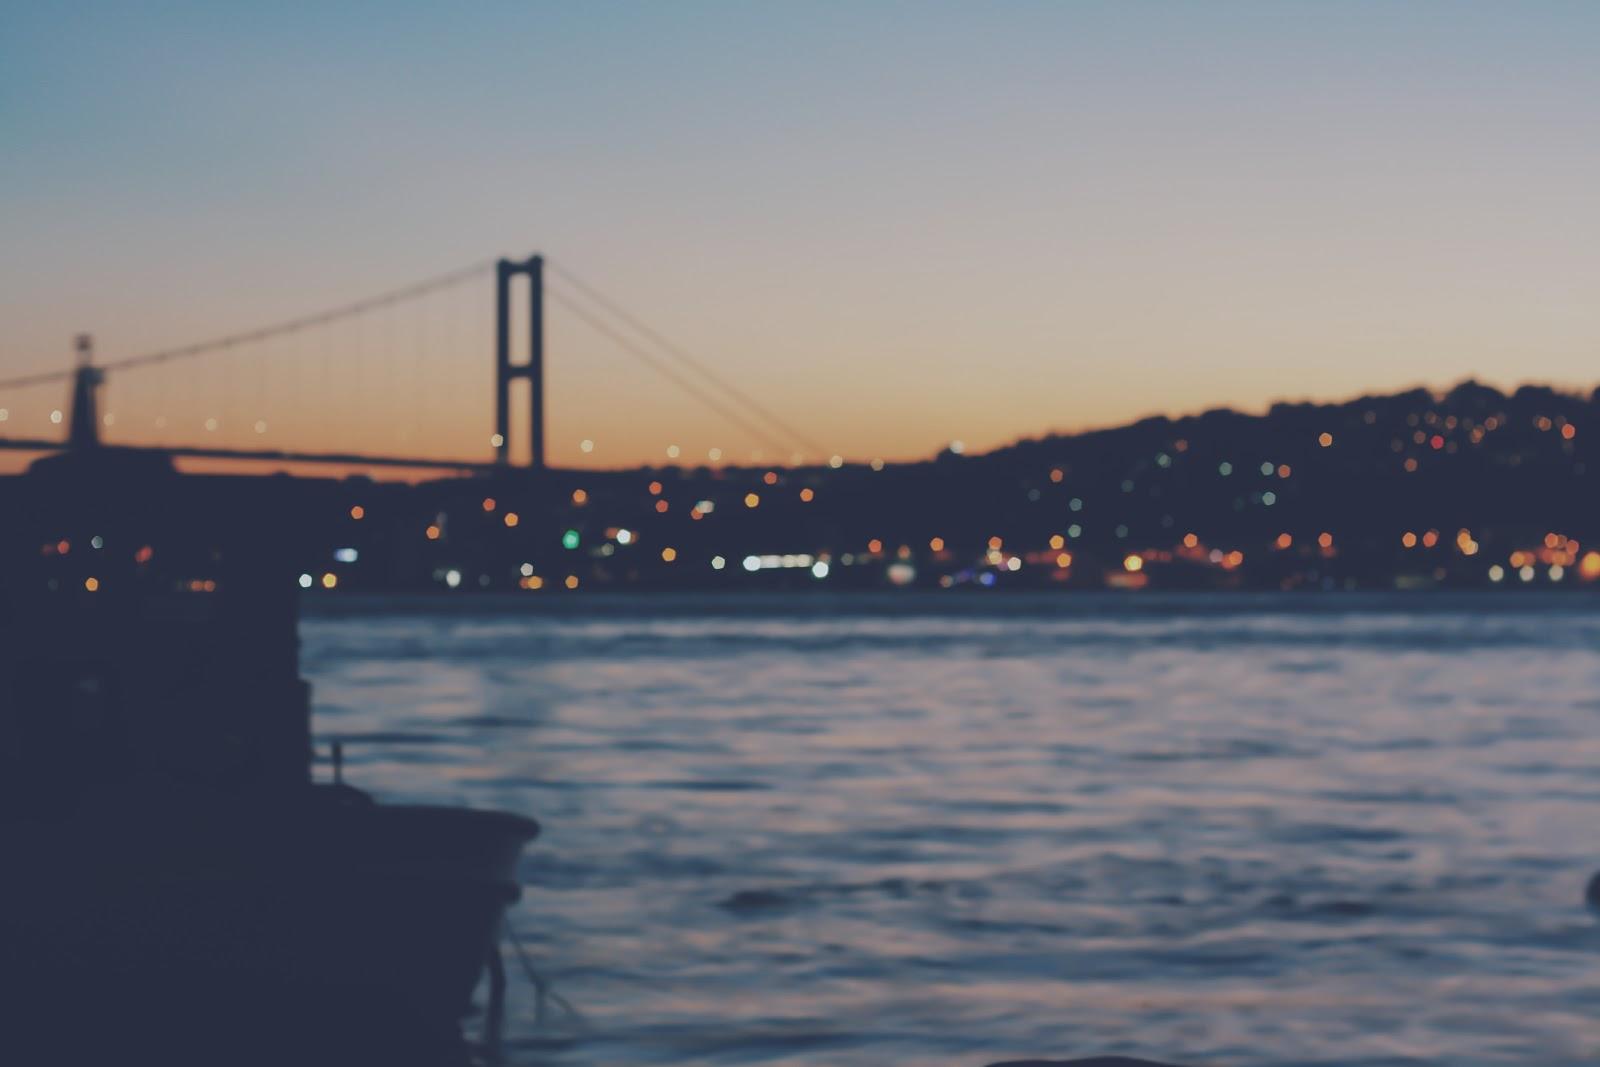 İstanbul, Bosphorus bridge